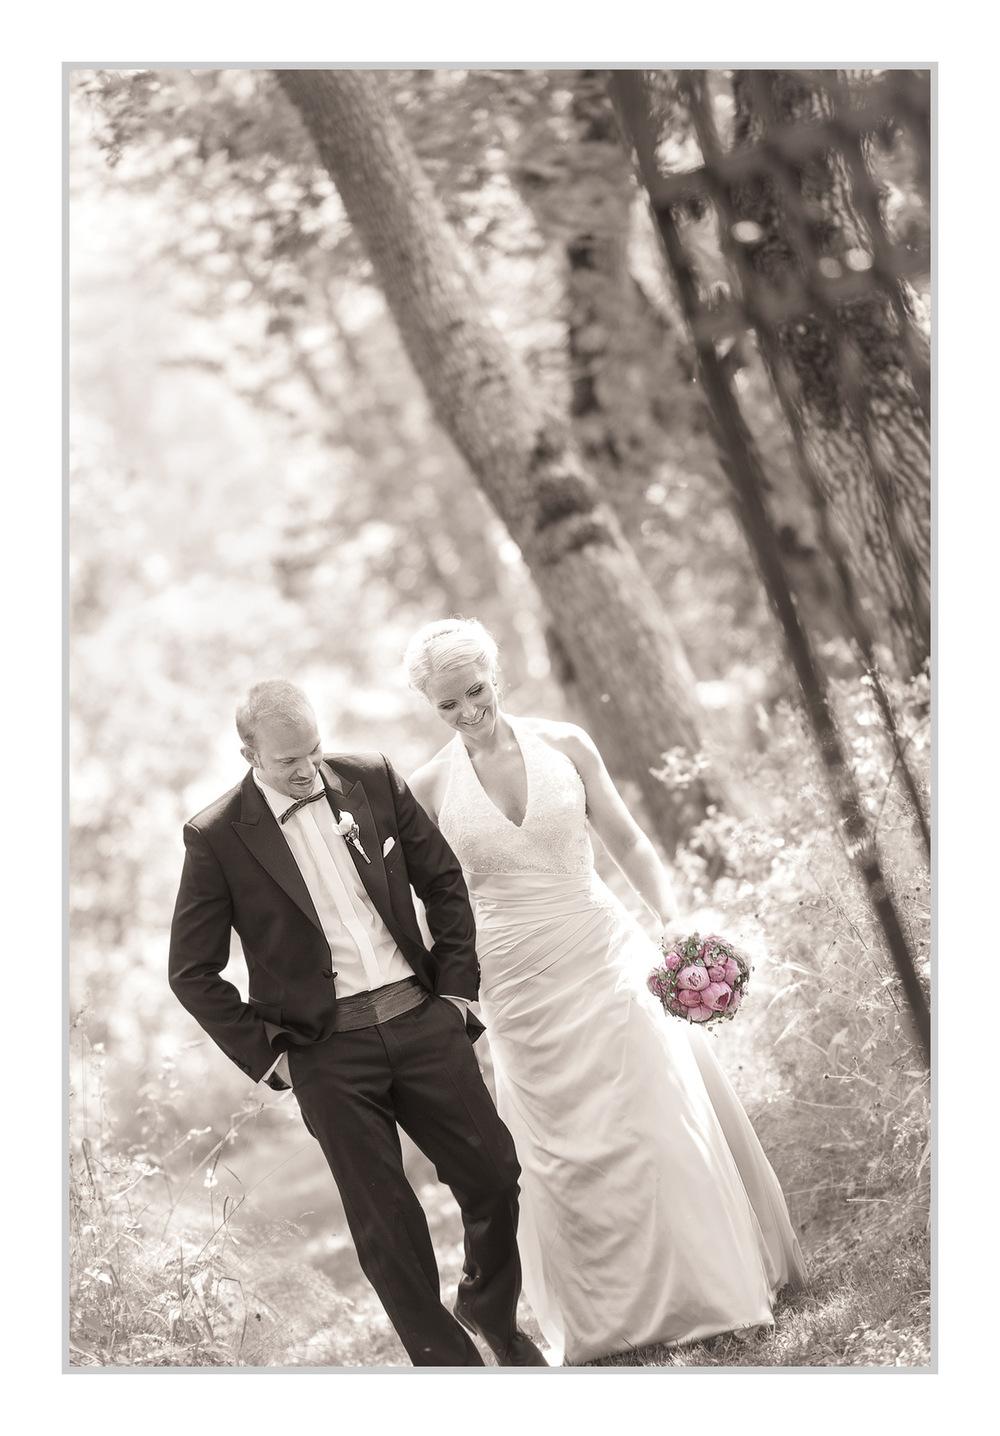 Samuel Edstrom - Weddings